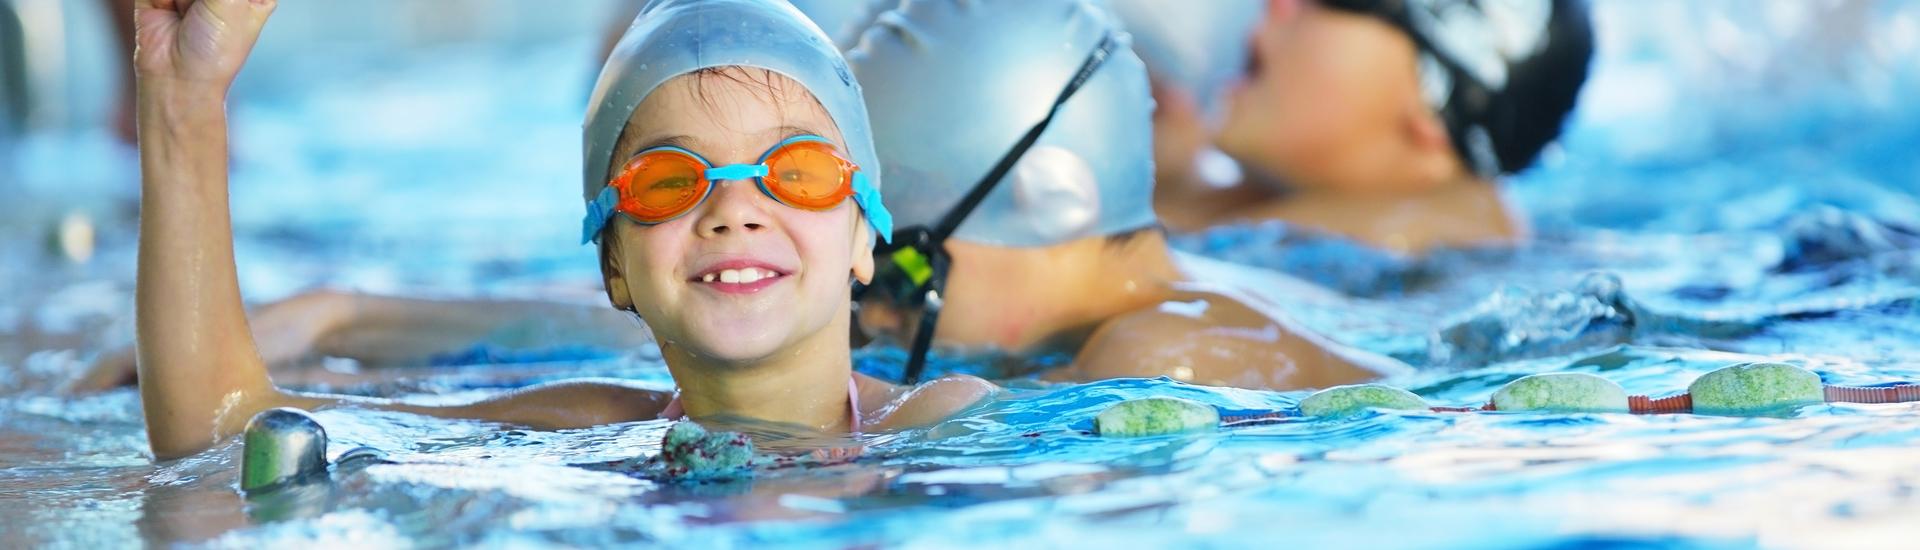 Anteprima Scuola Nuoto Bambini*